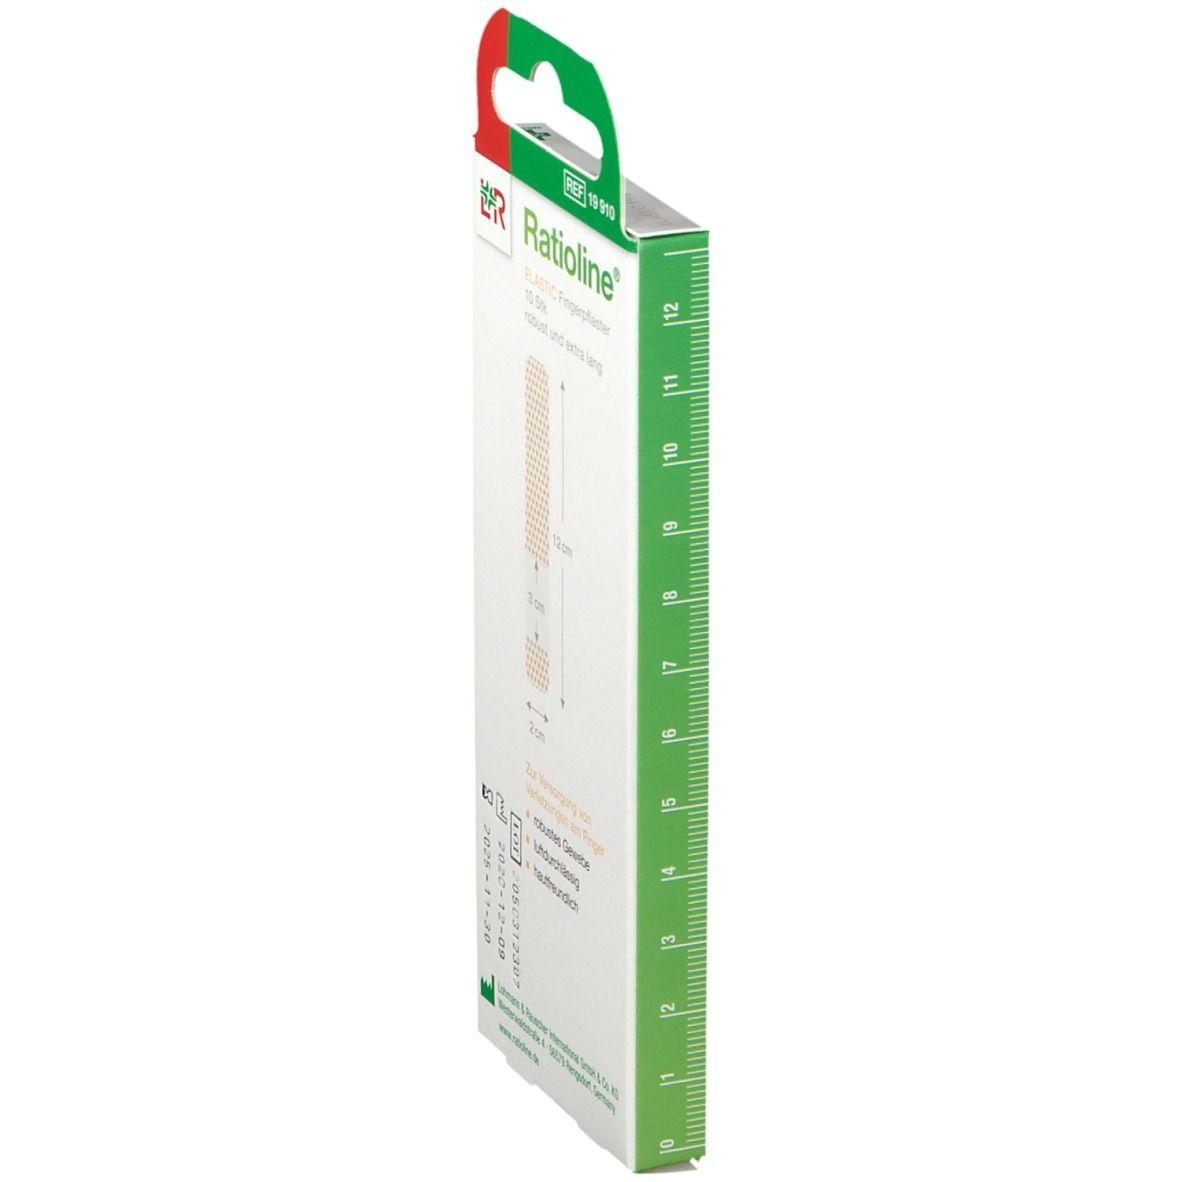 Ratioline® elastic Fingerverband 2 x 12 cm